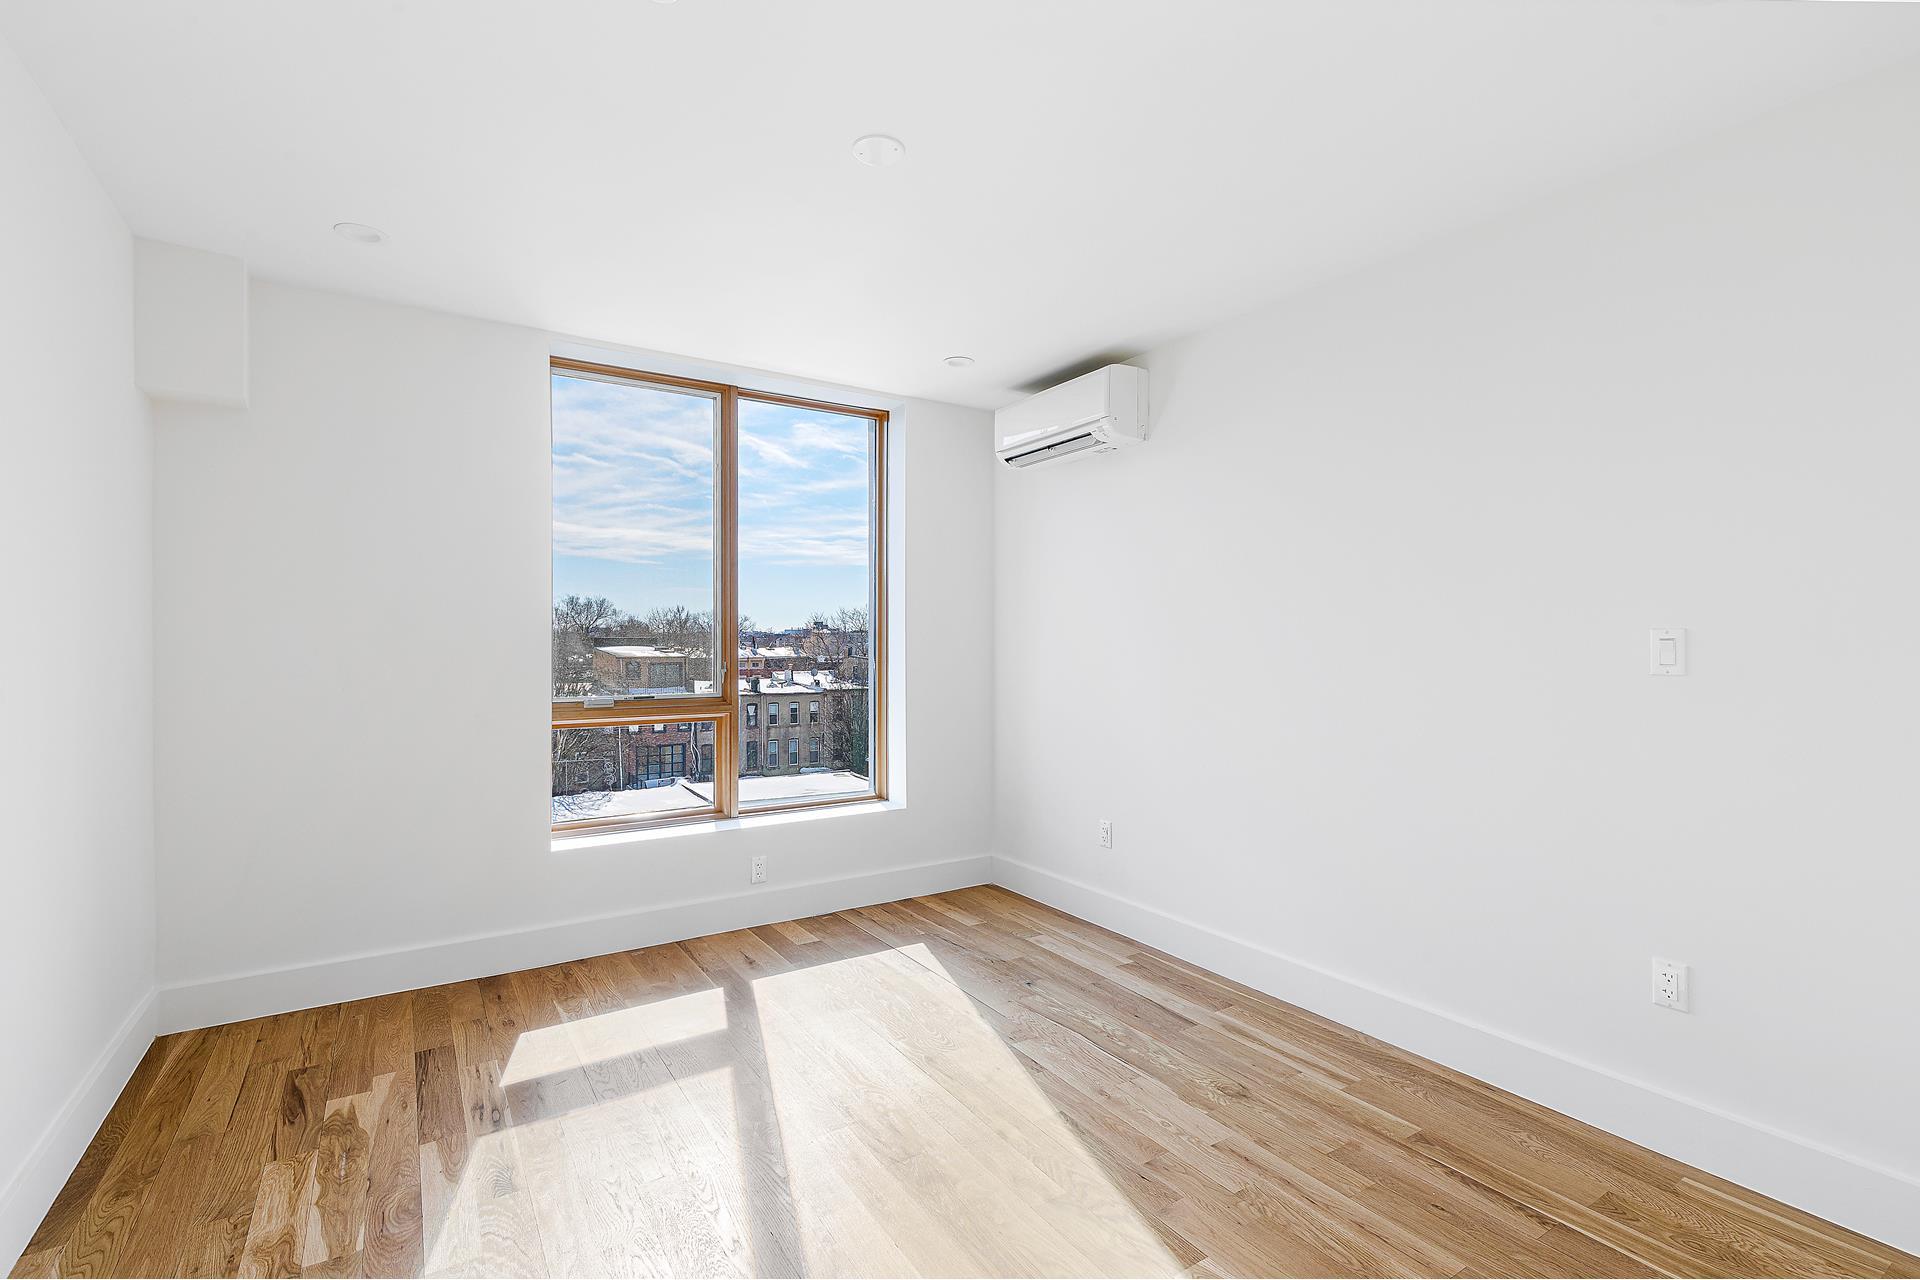 819 Lexington Avenue Bedford Stuyvesant Brooklyn NY 11221